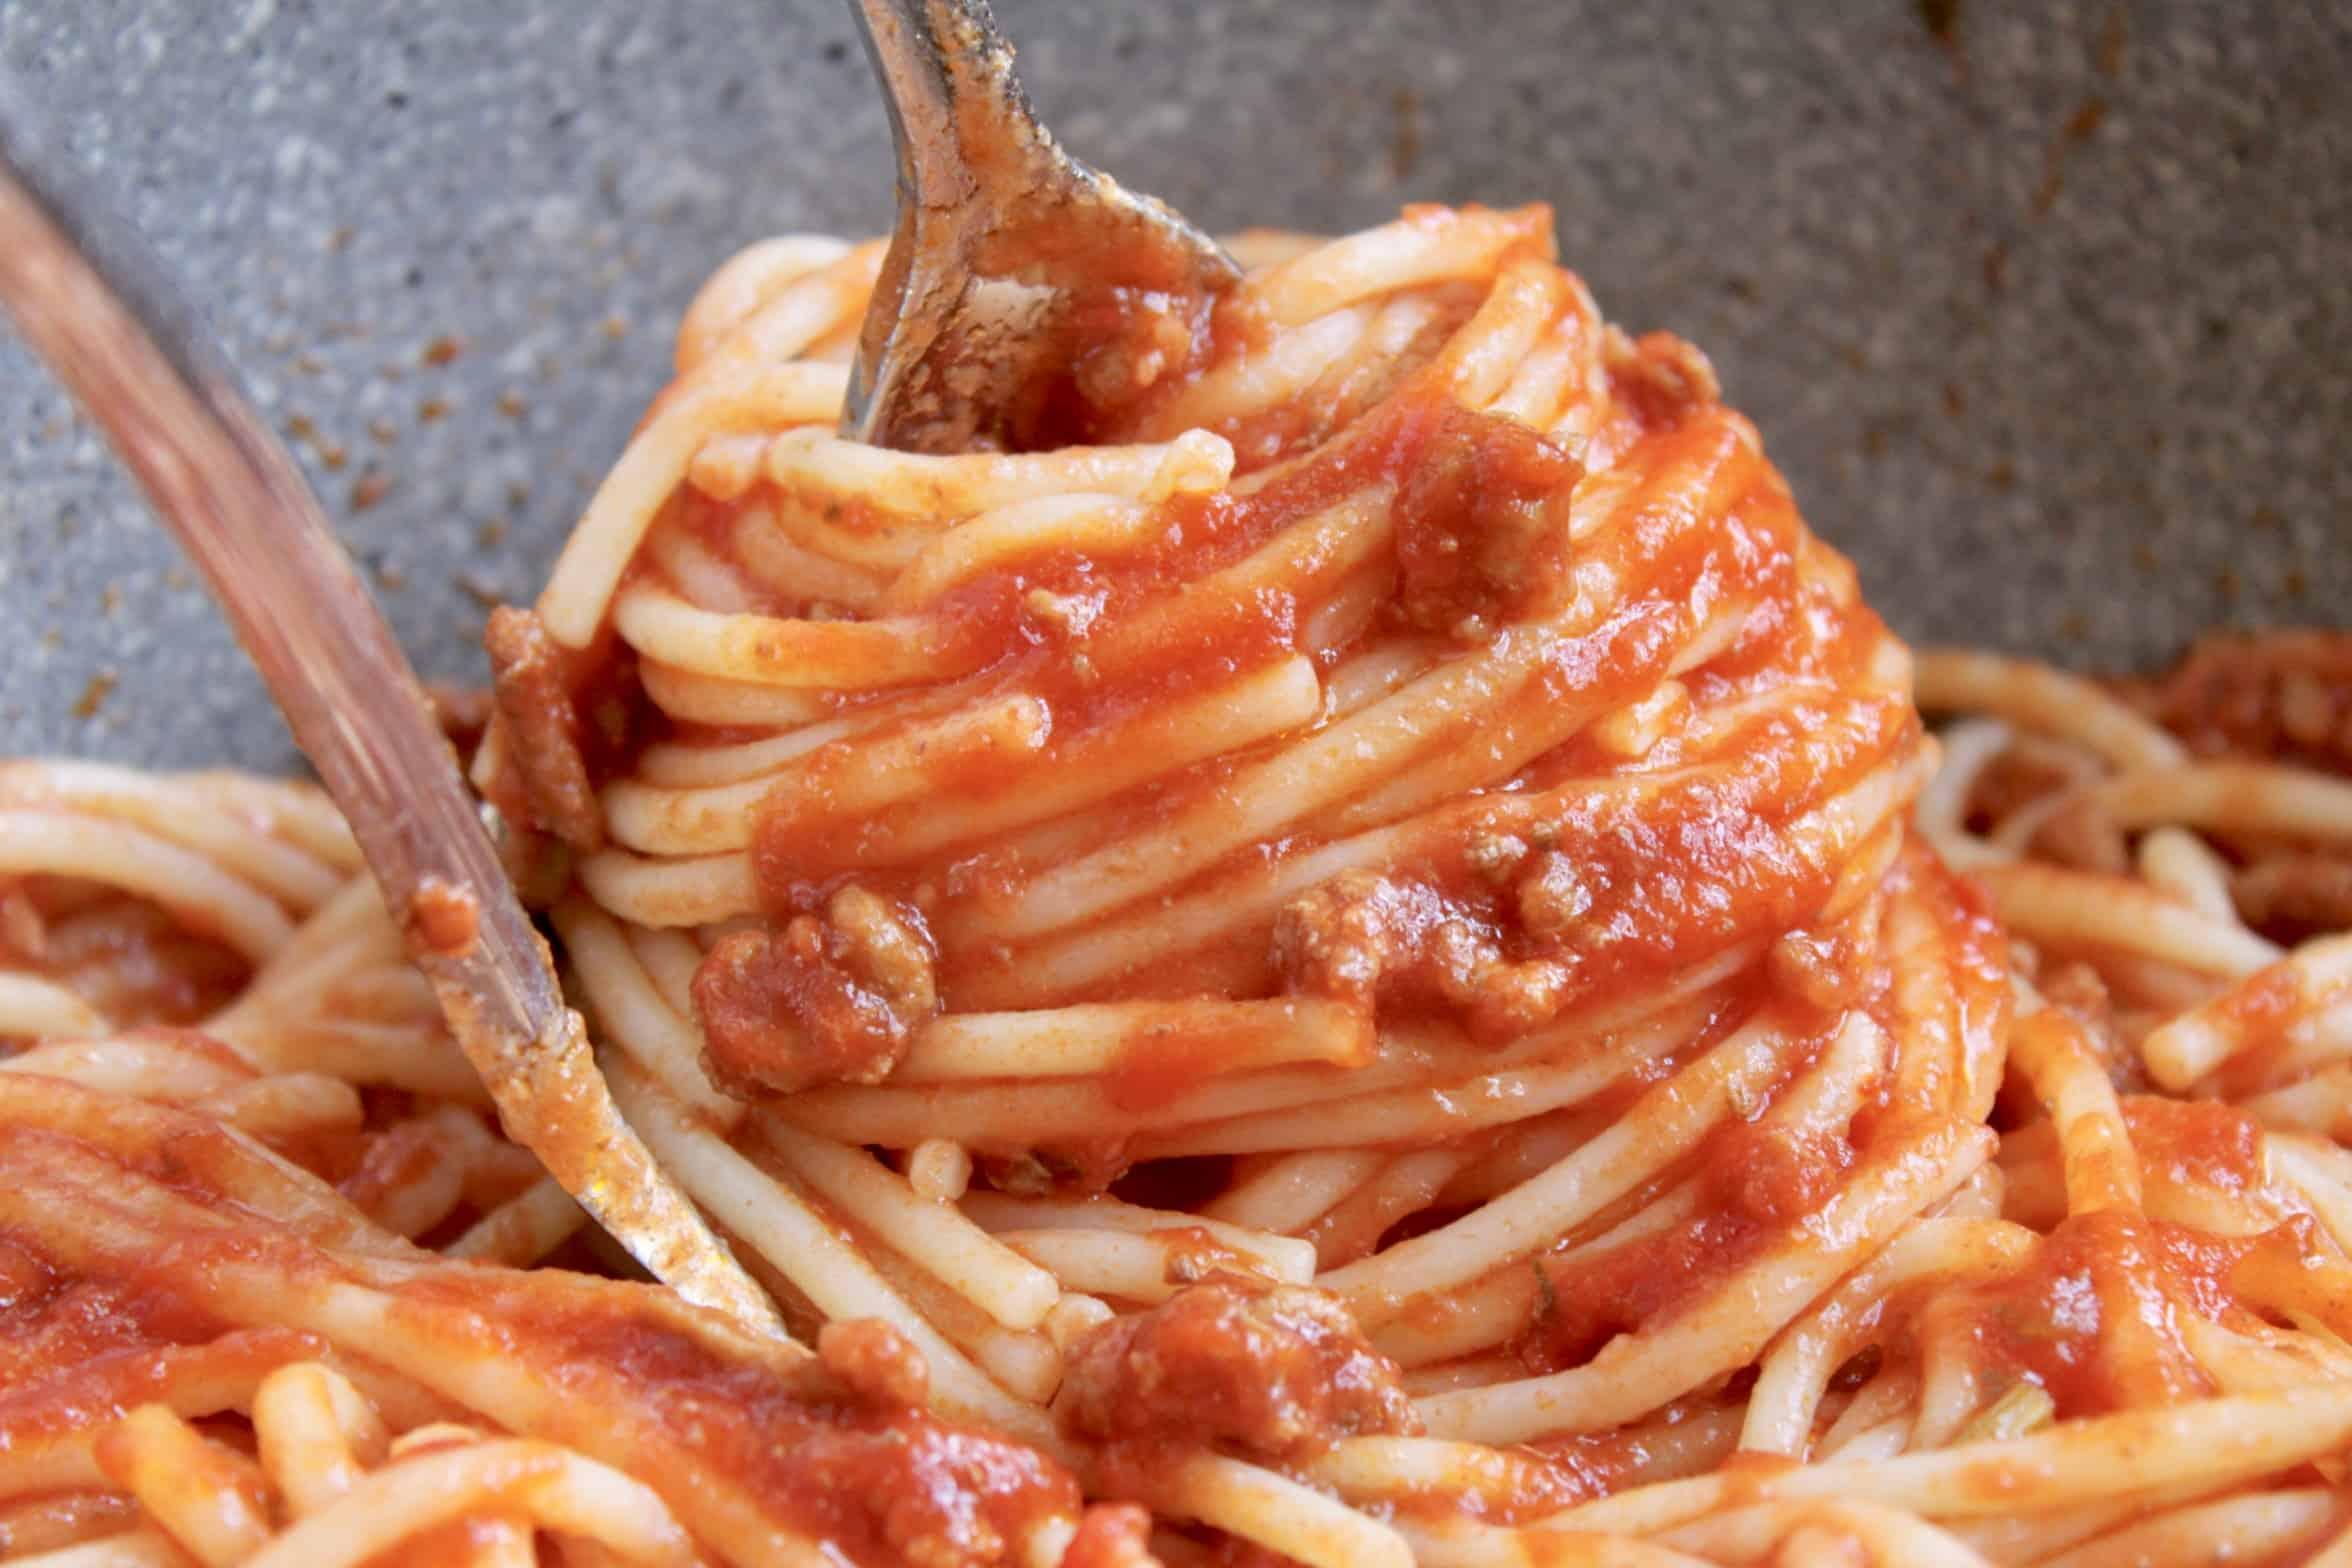 spaghetti twirled to serve